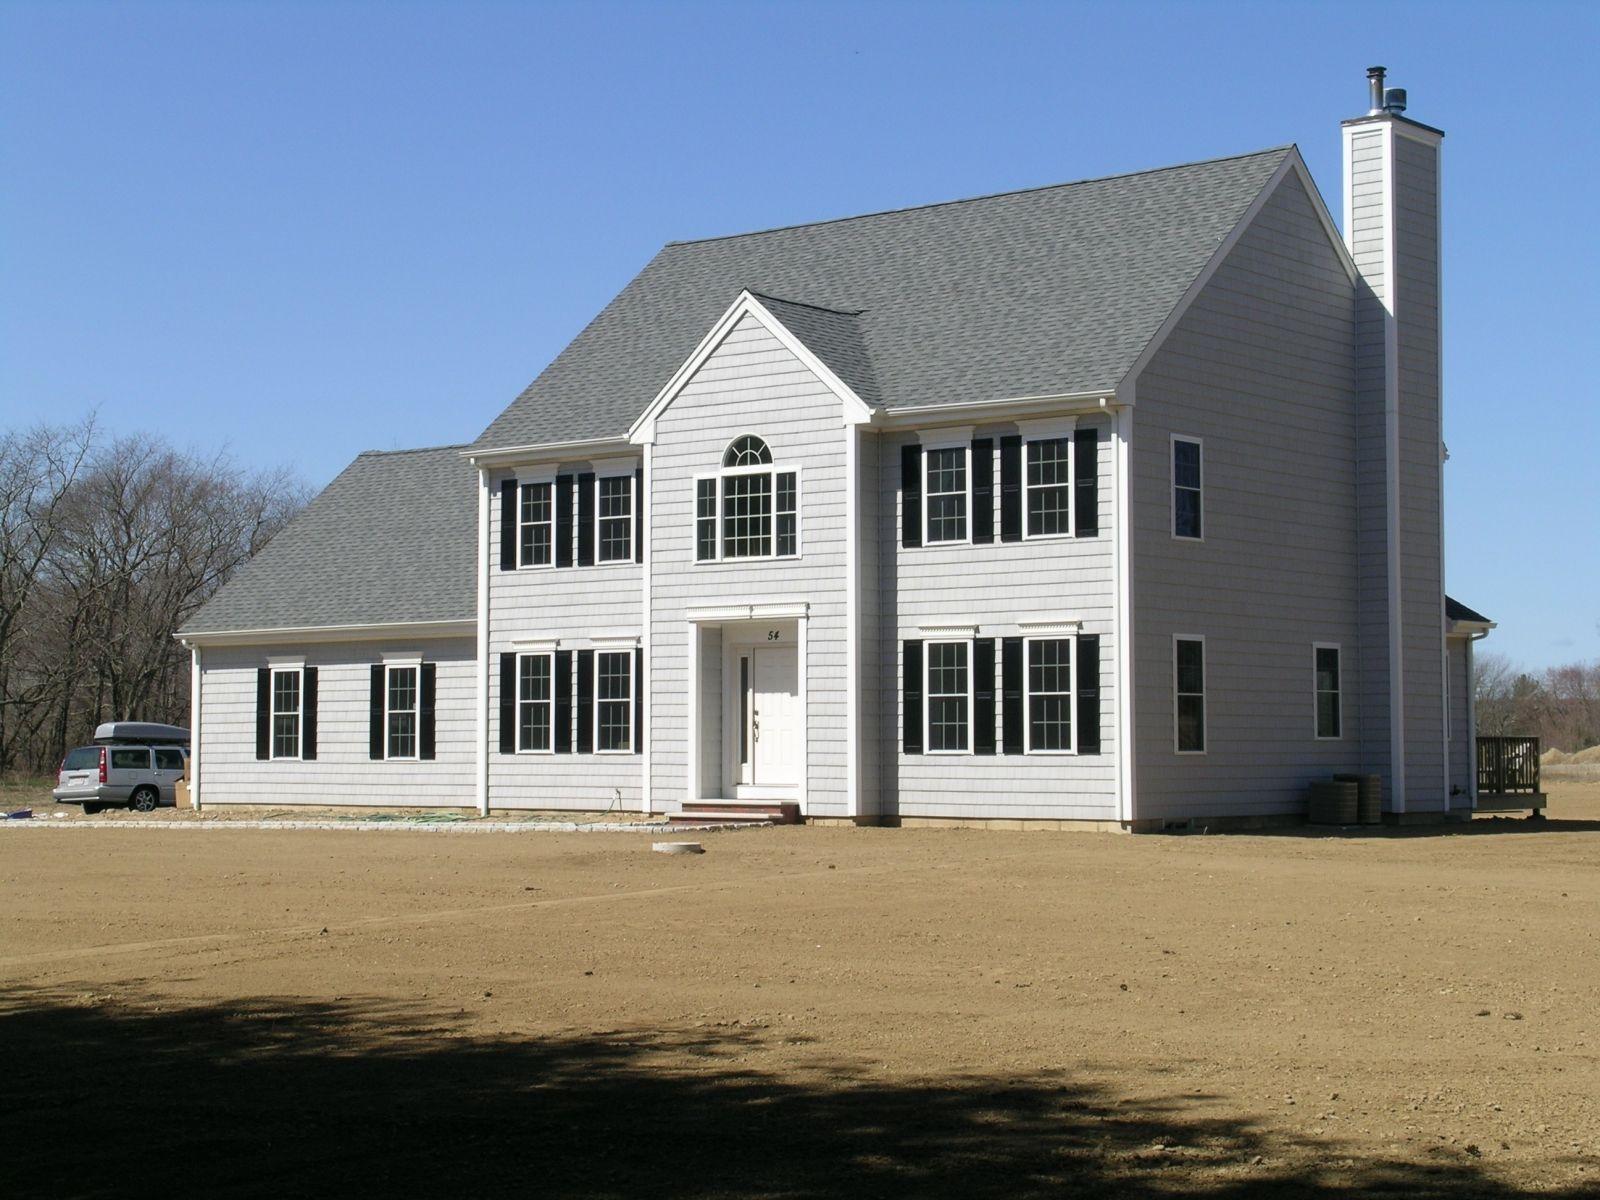 Real Estate Basic